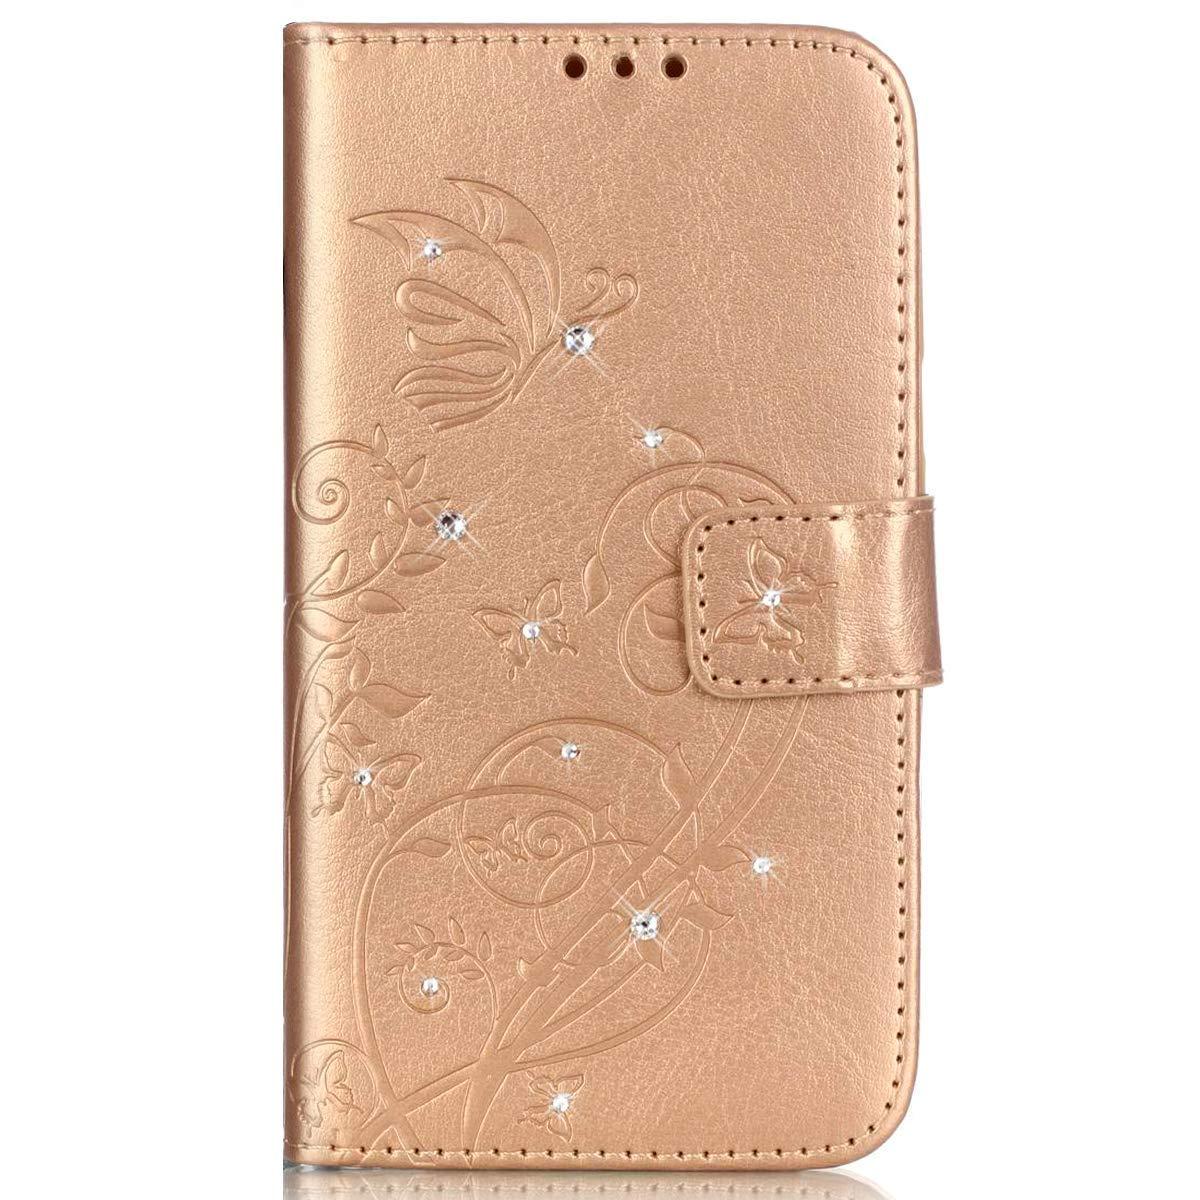 kompatibel mit Galaxy S8 Plus H/ülle,Handyh/ülle Galaxy S8 Plus Blume Schmetterling Glitzer Strass Diamant PU Lederh/ülle Flip H/ülle Wallet Tasche Schutzh/ülle f/ür Galaxy S8 Plus,Blau